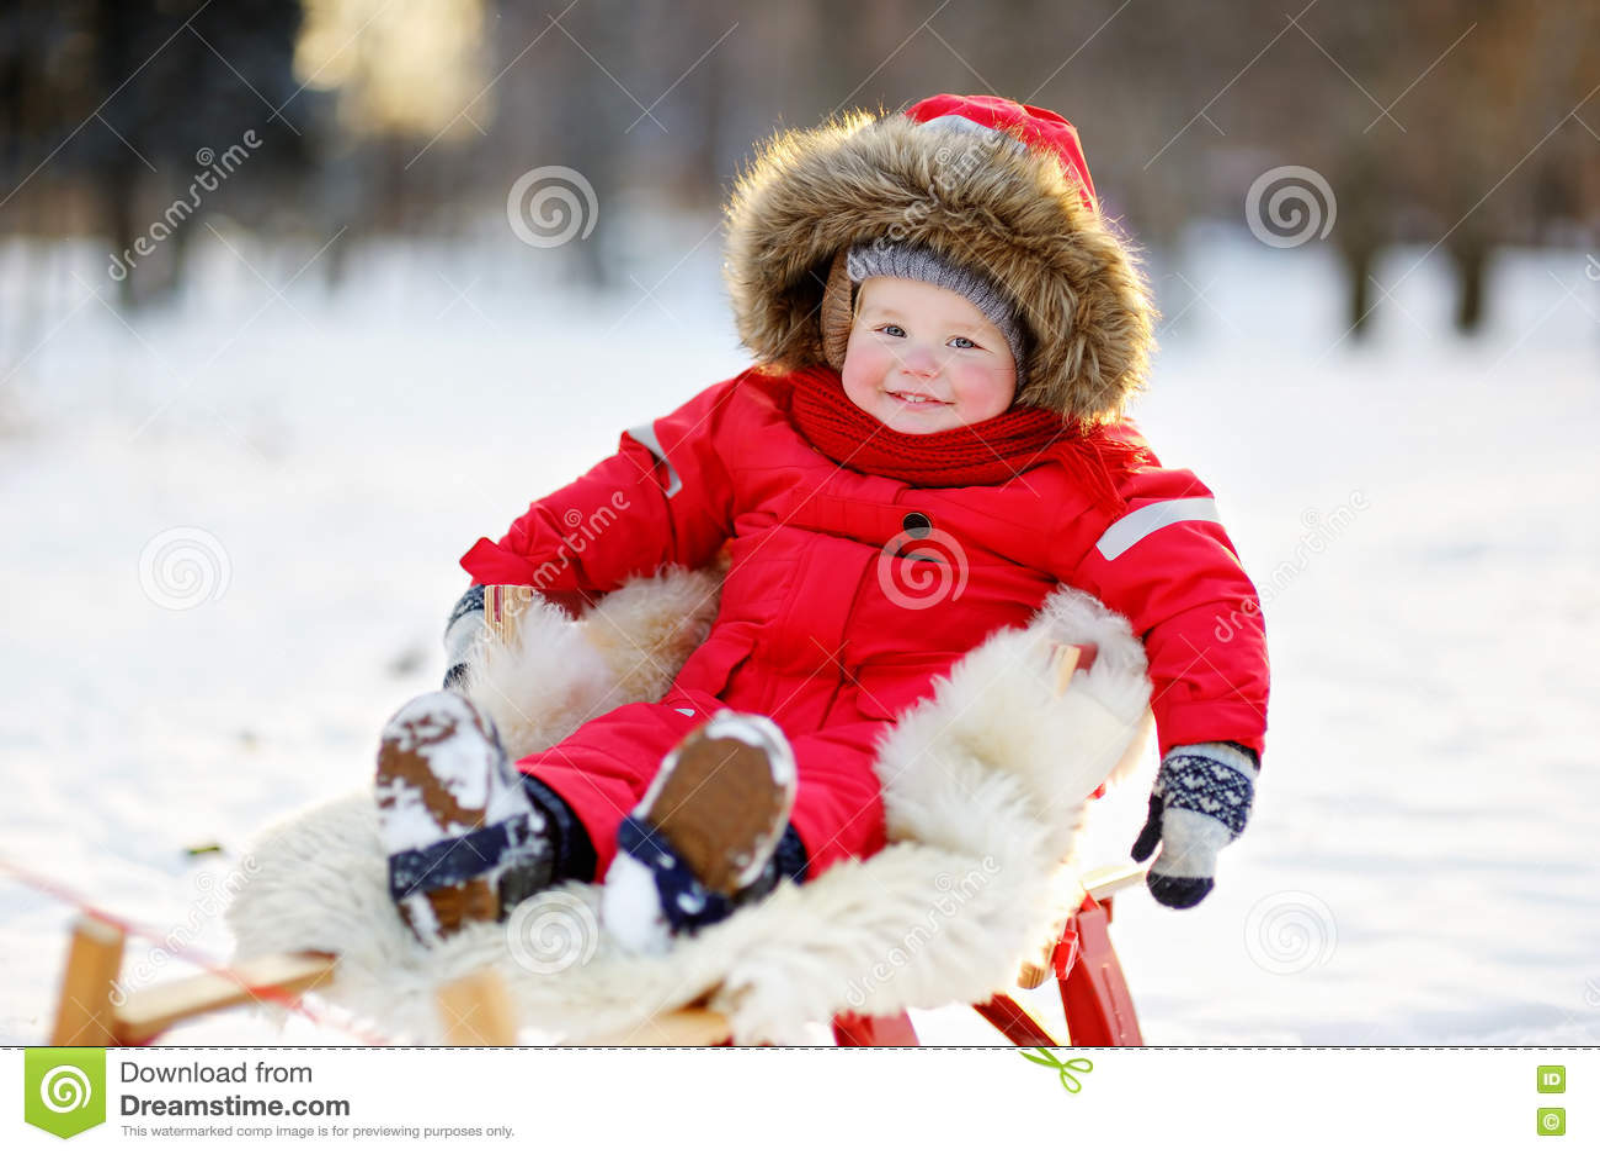 Winter portrait of toddler